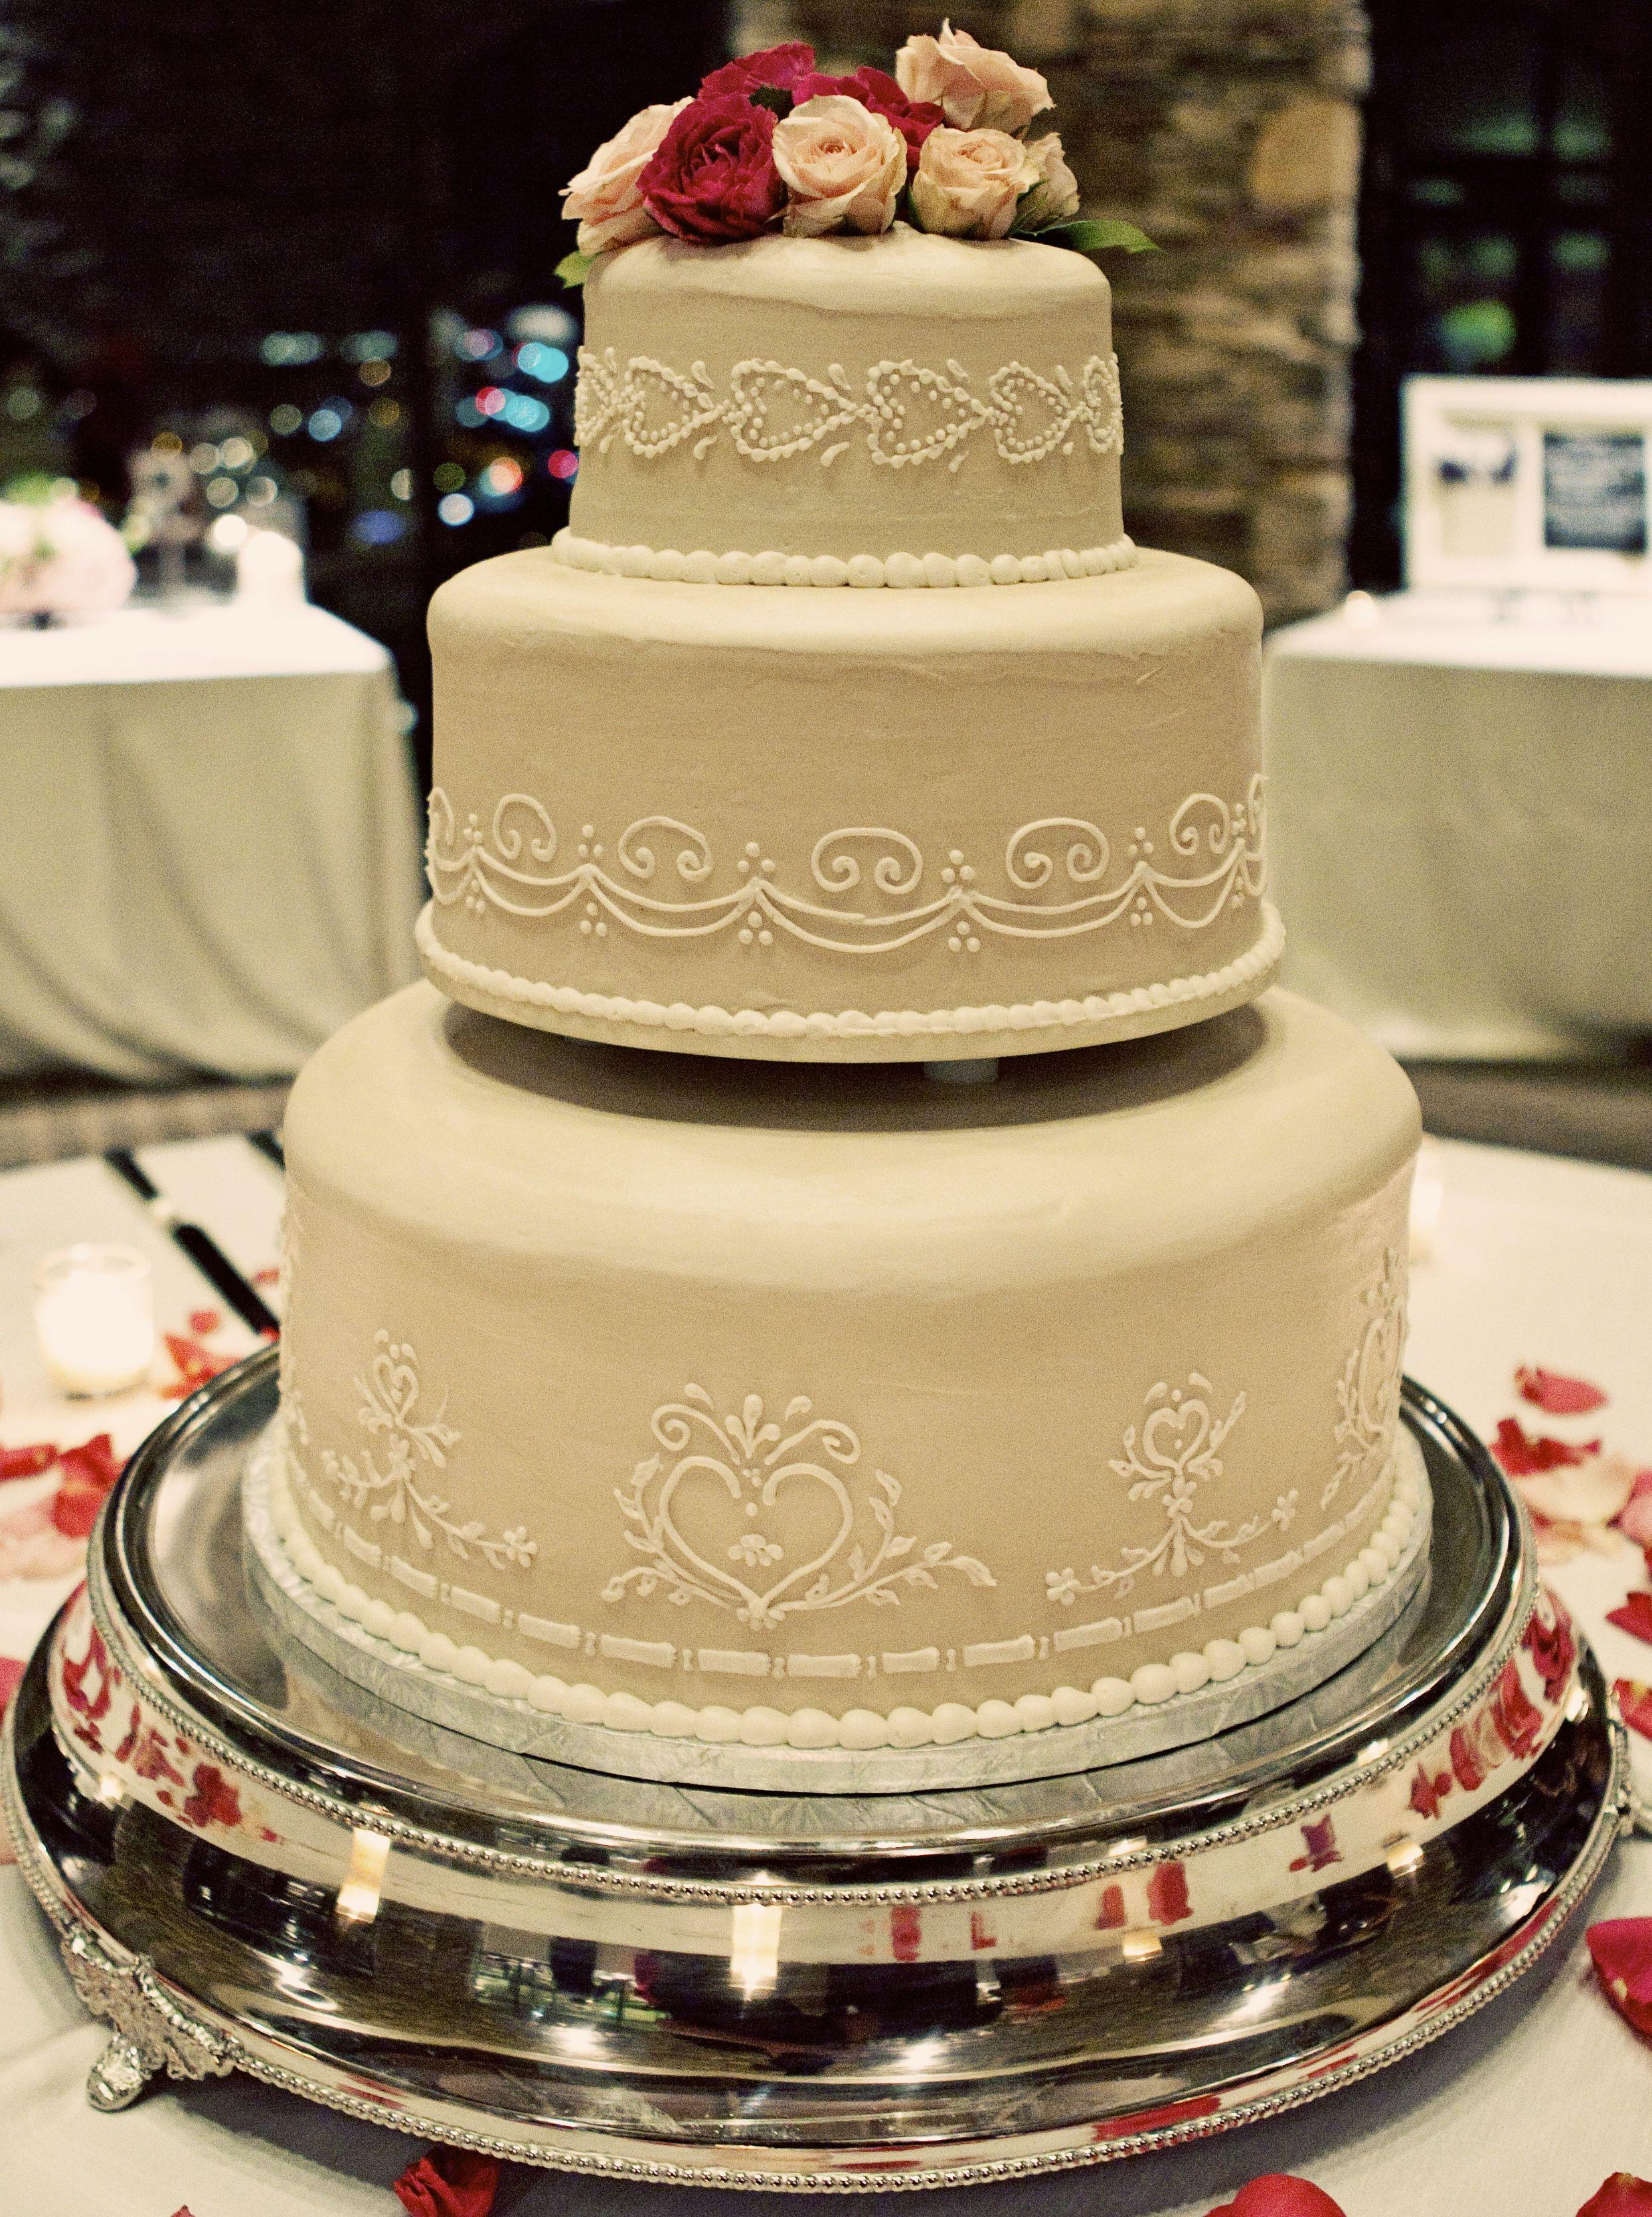 Weddings - VG Donut and Bakery   Wedding Ideas 2   Pinterest   Vg ...